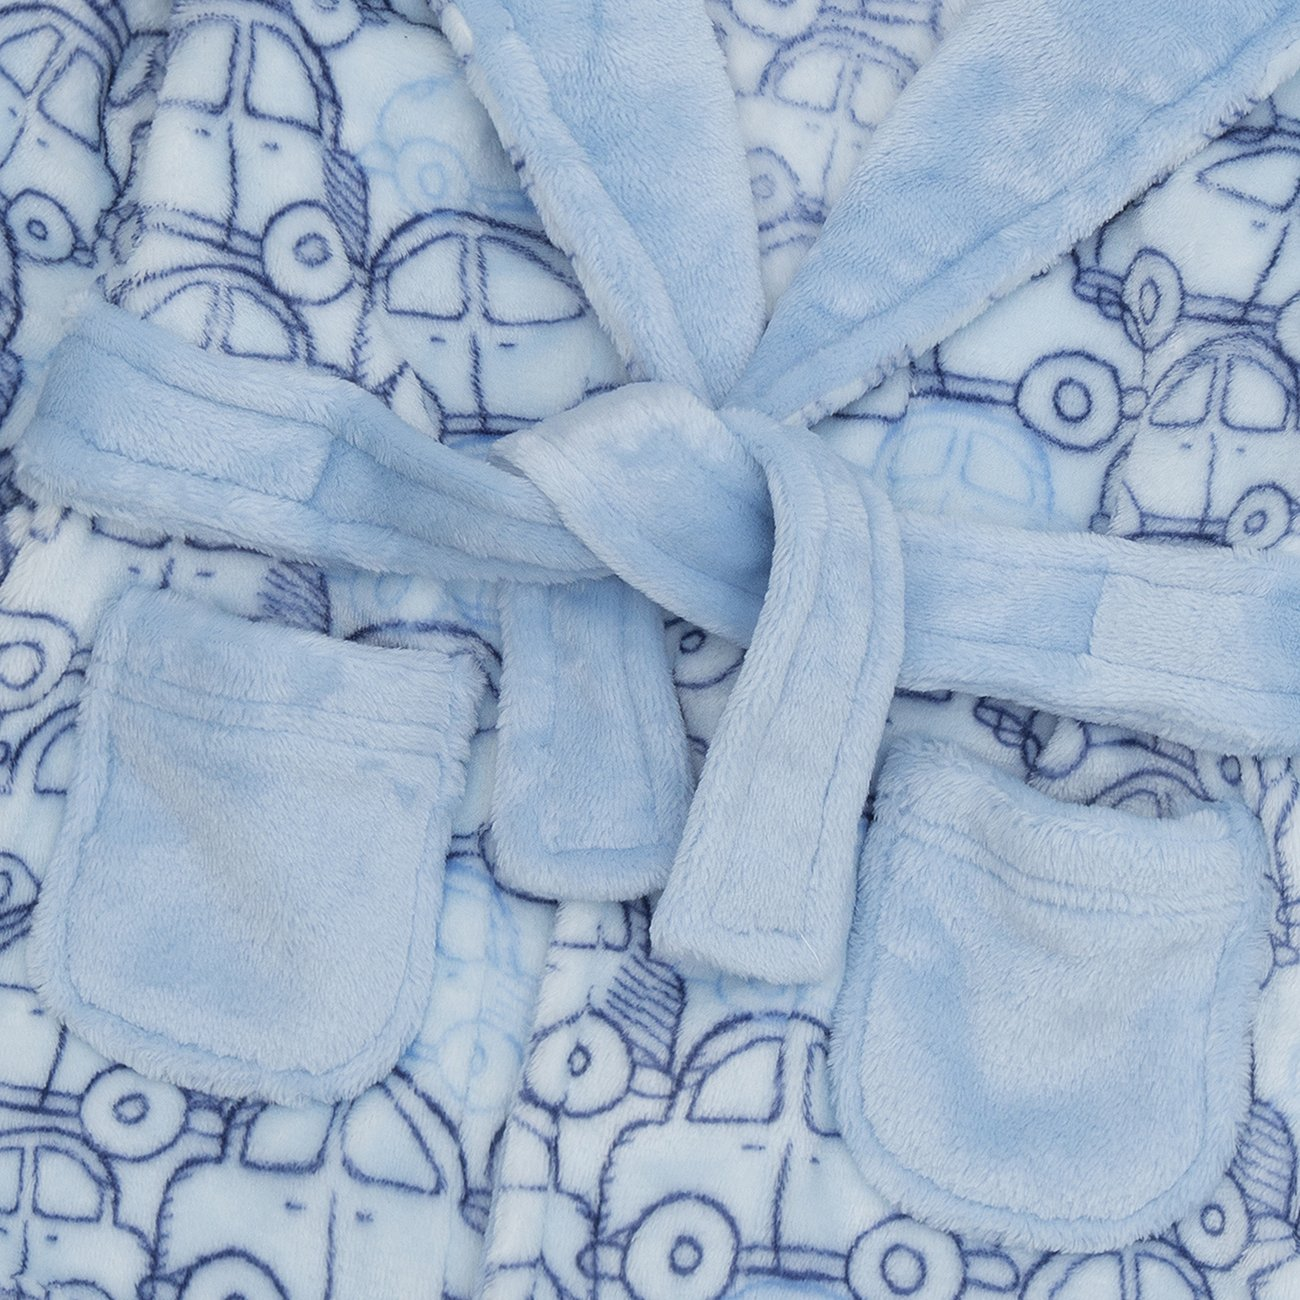 Ages 6-24 Months Flannel Fleece Hooded Night Gown Babytown Newborn Baby Boys Bathrobe